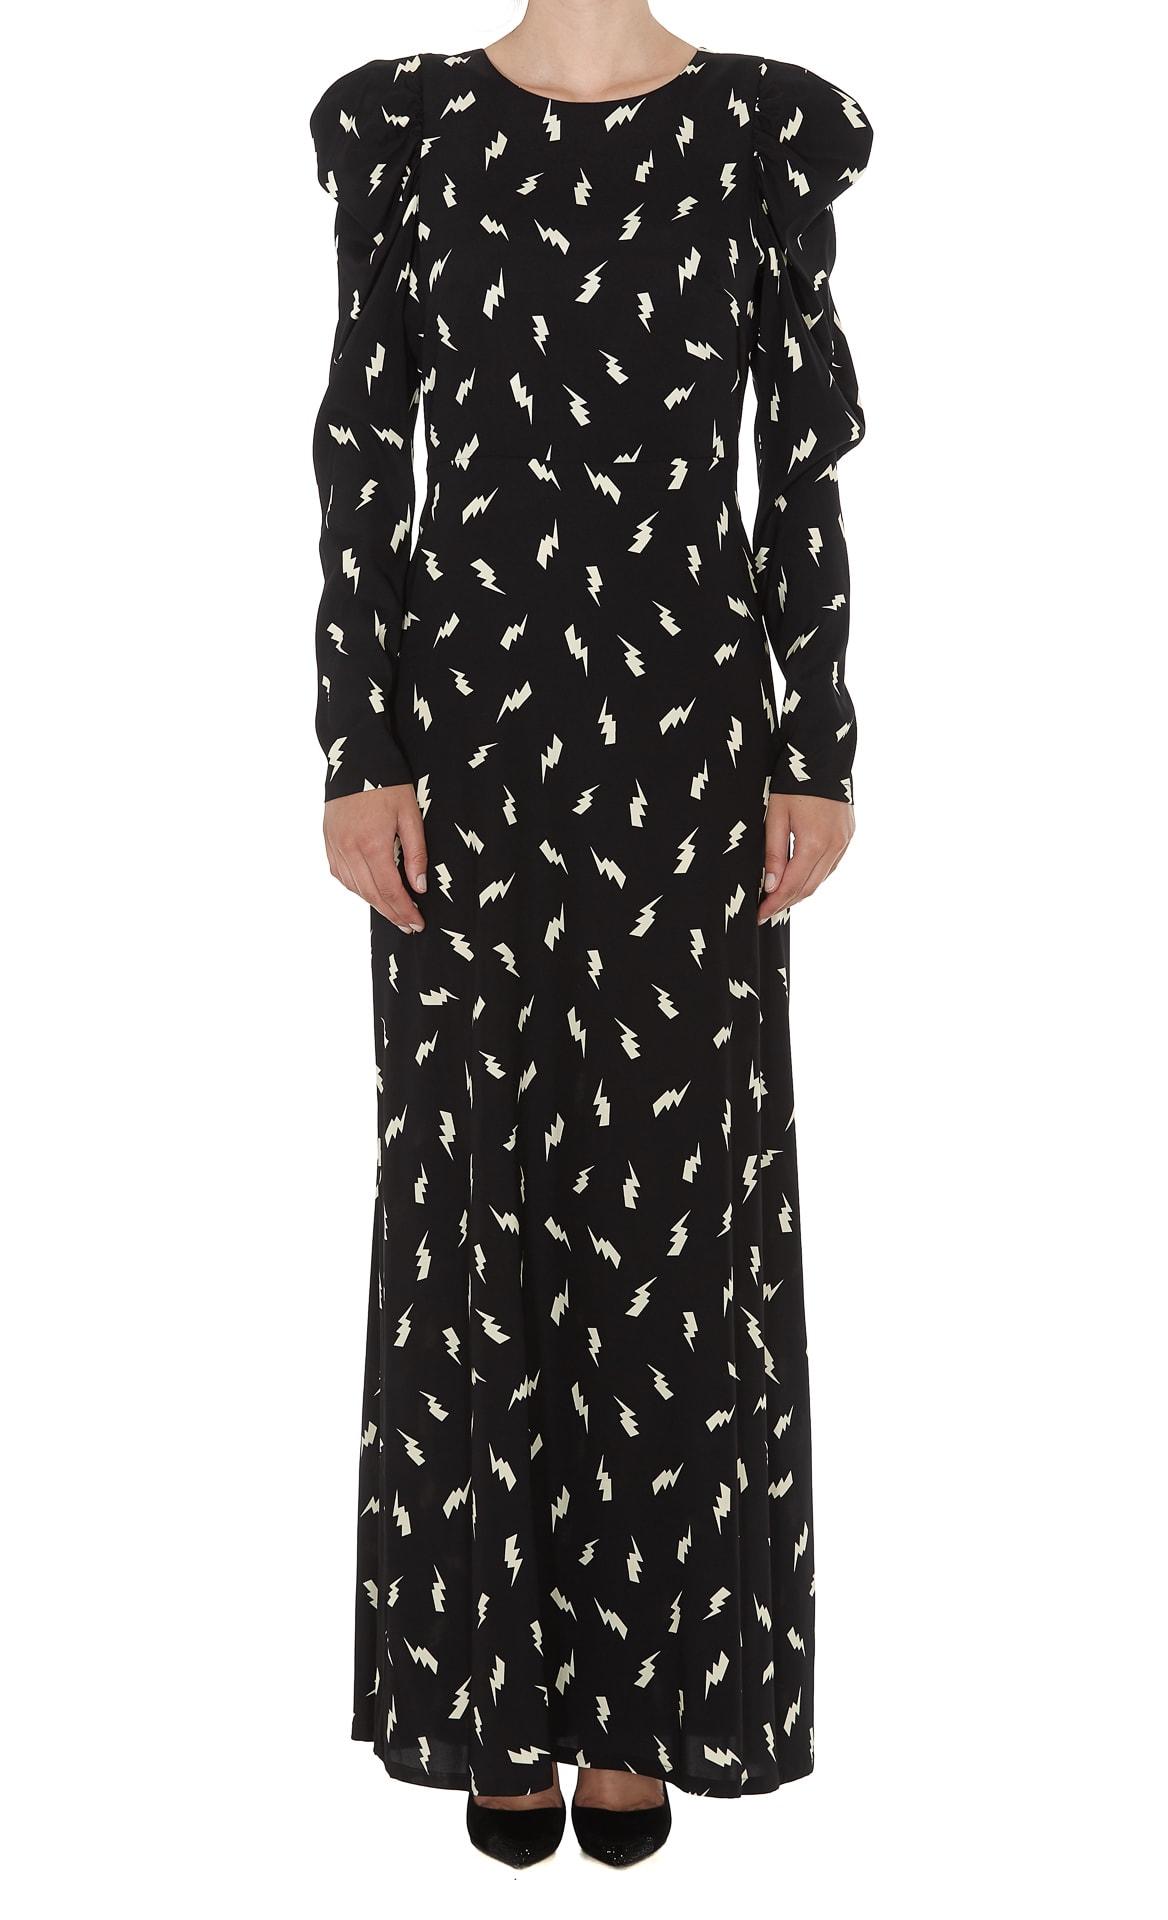 Parosh Slight Dress